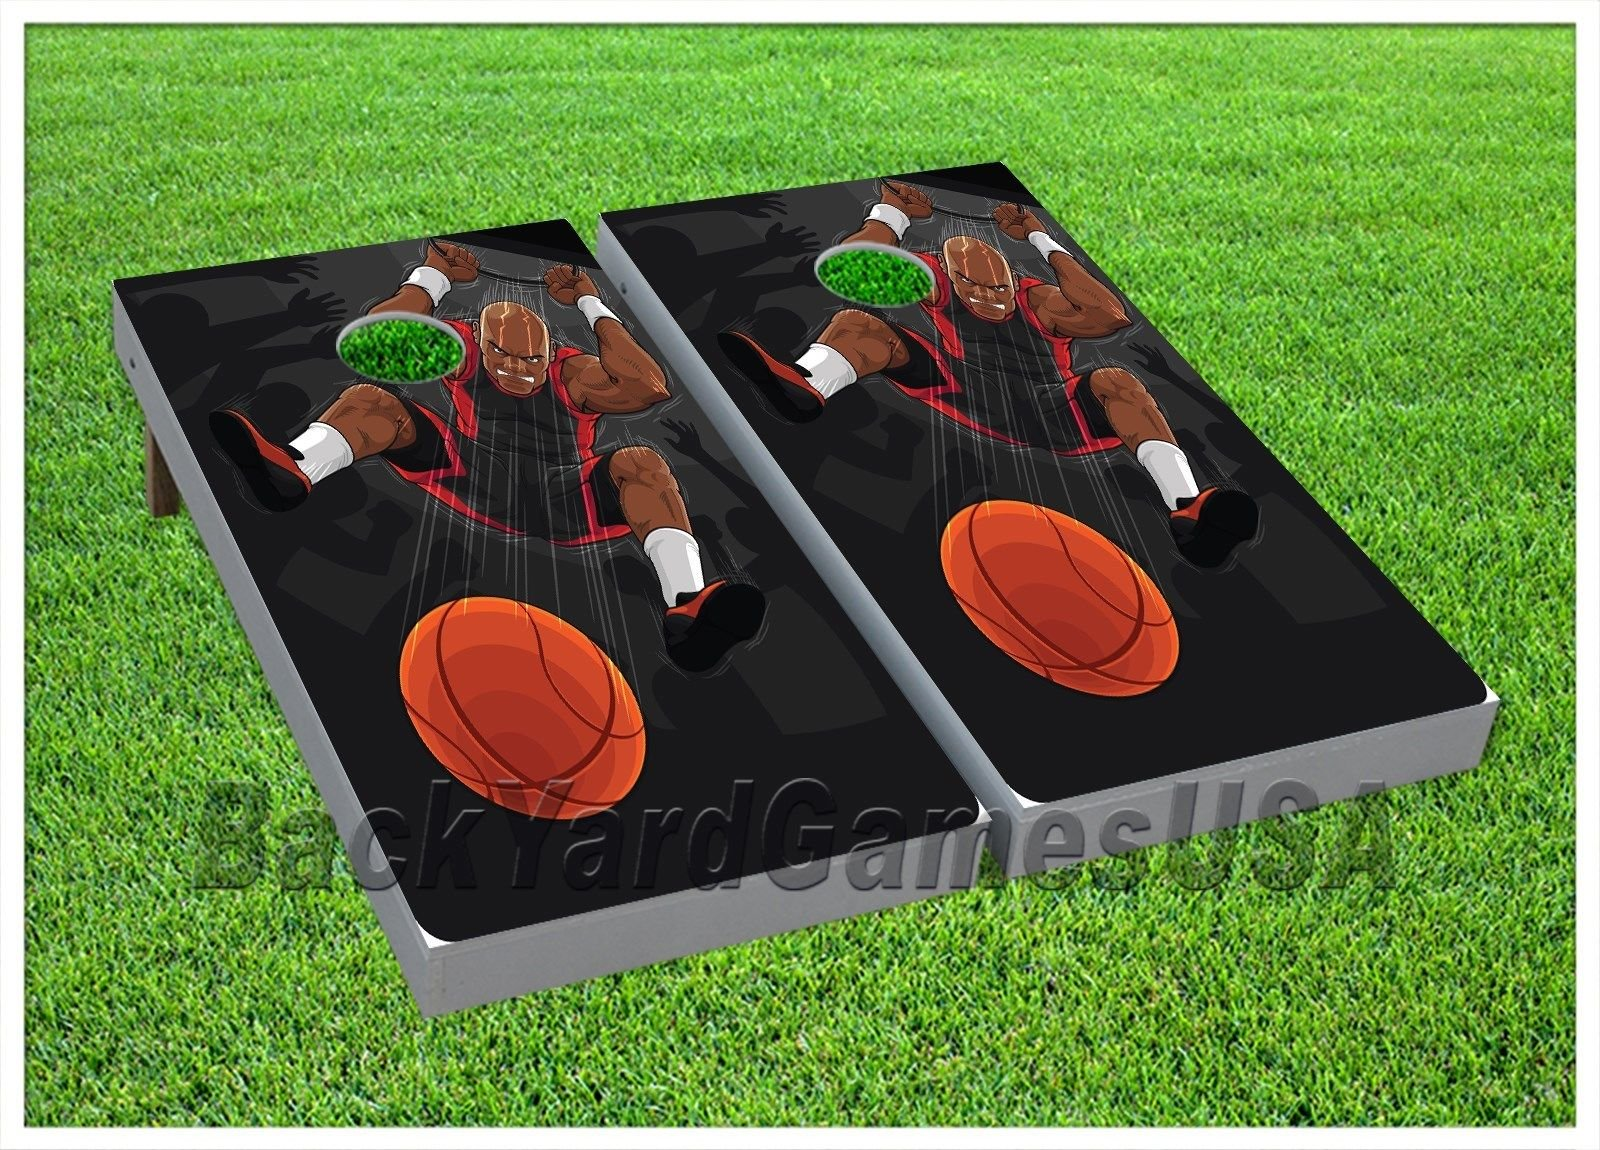 CORNHOLE BEANBAG TOSS GAME w Bags Game Board Massive Dunk NBA Fans Set 493